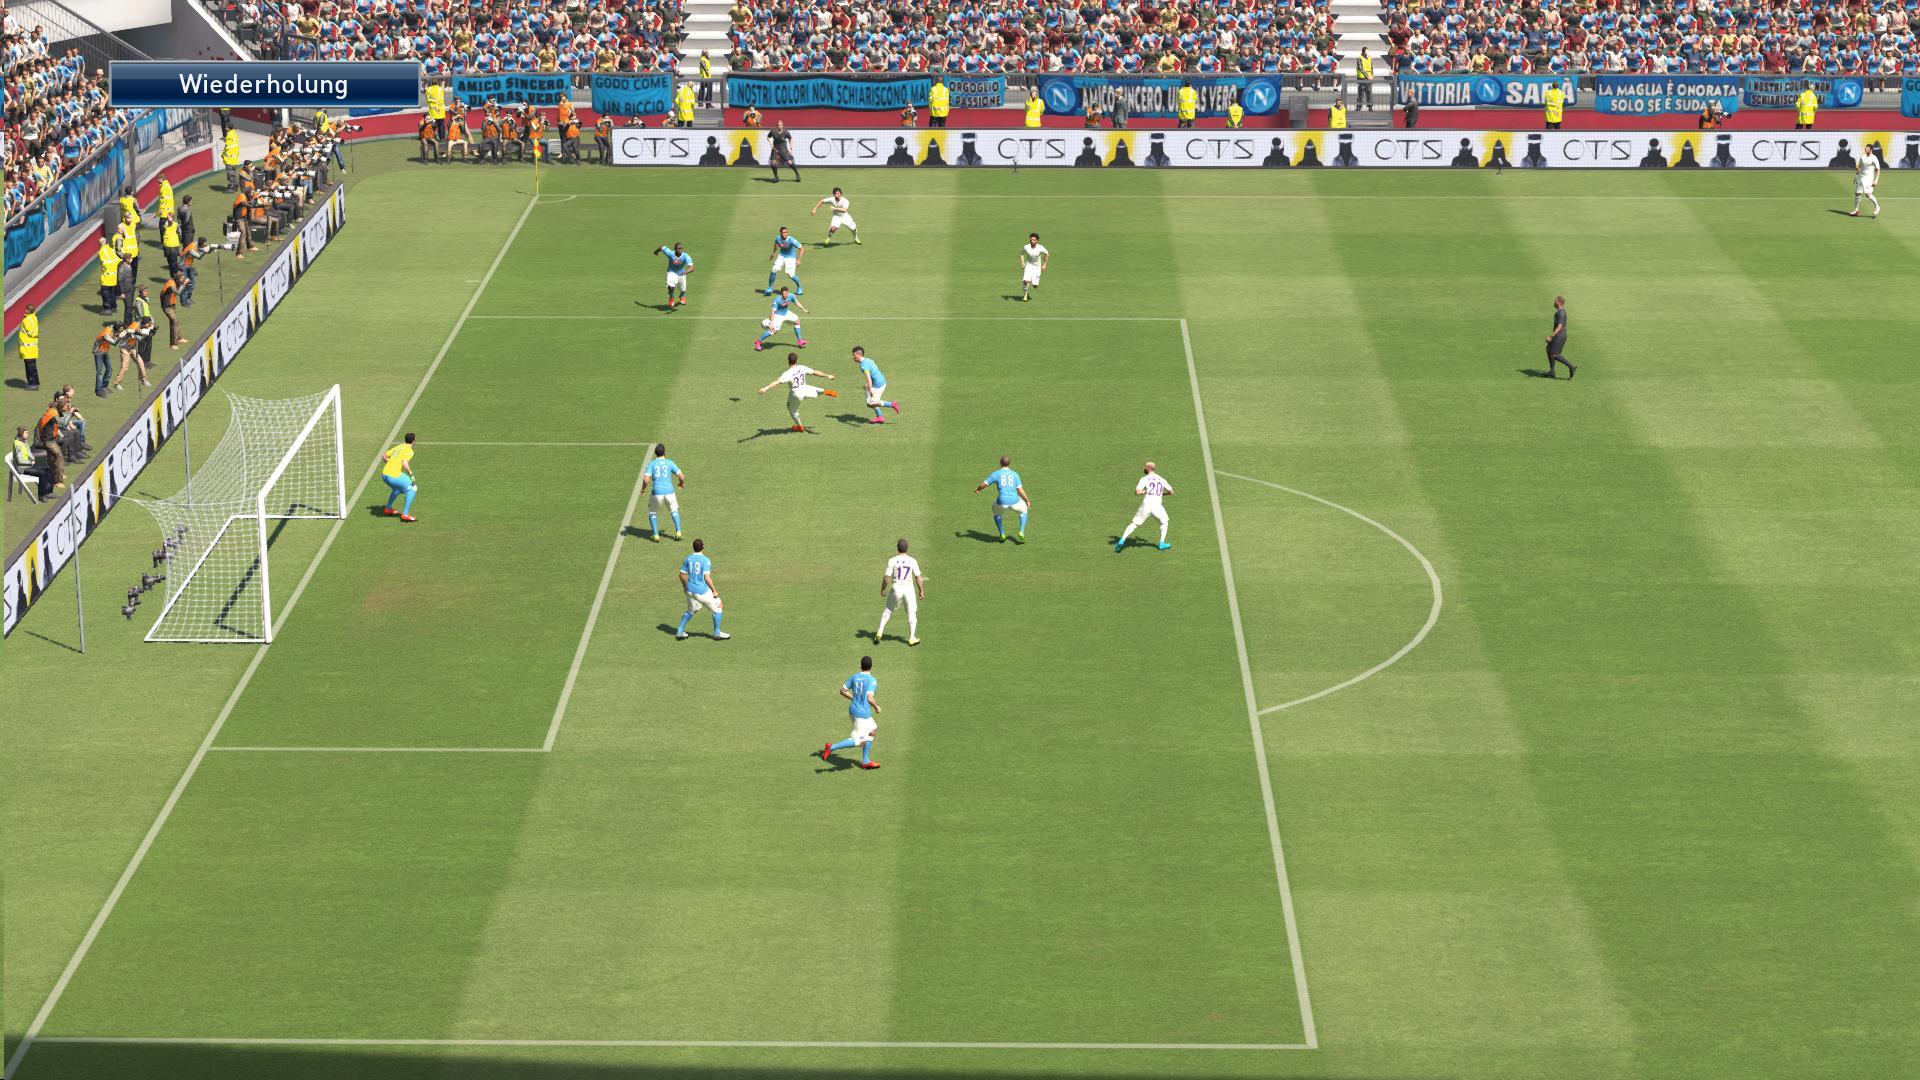 об игре fifa 12